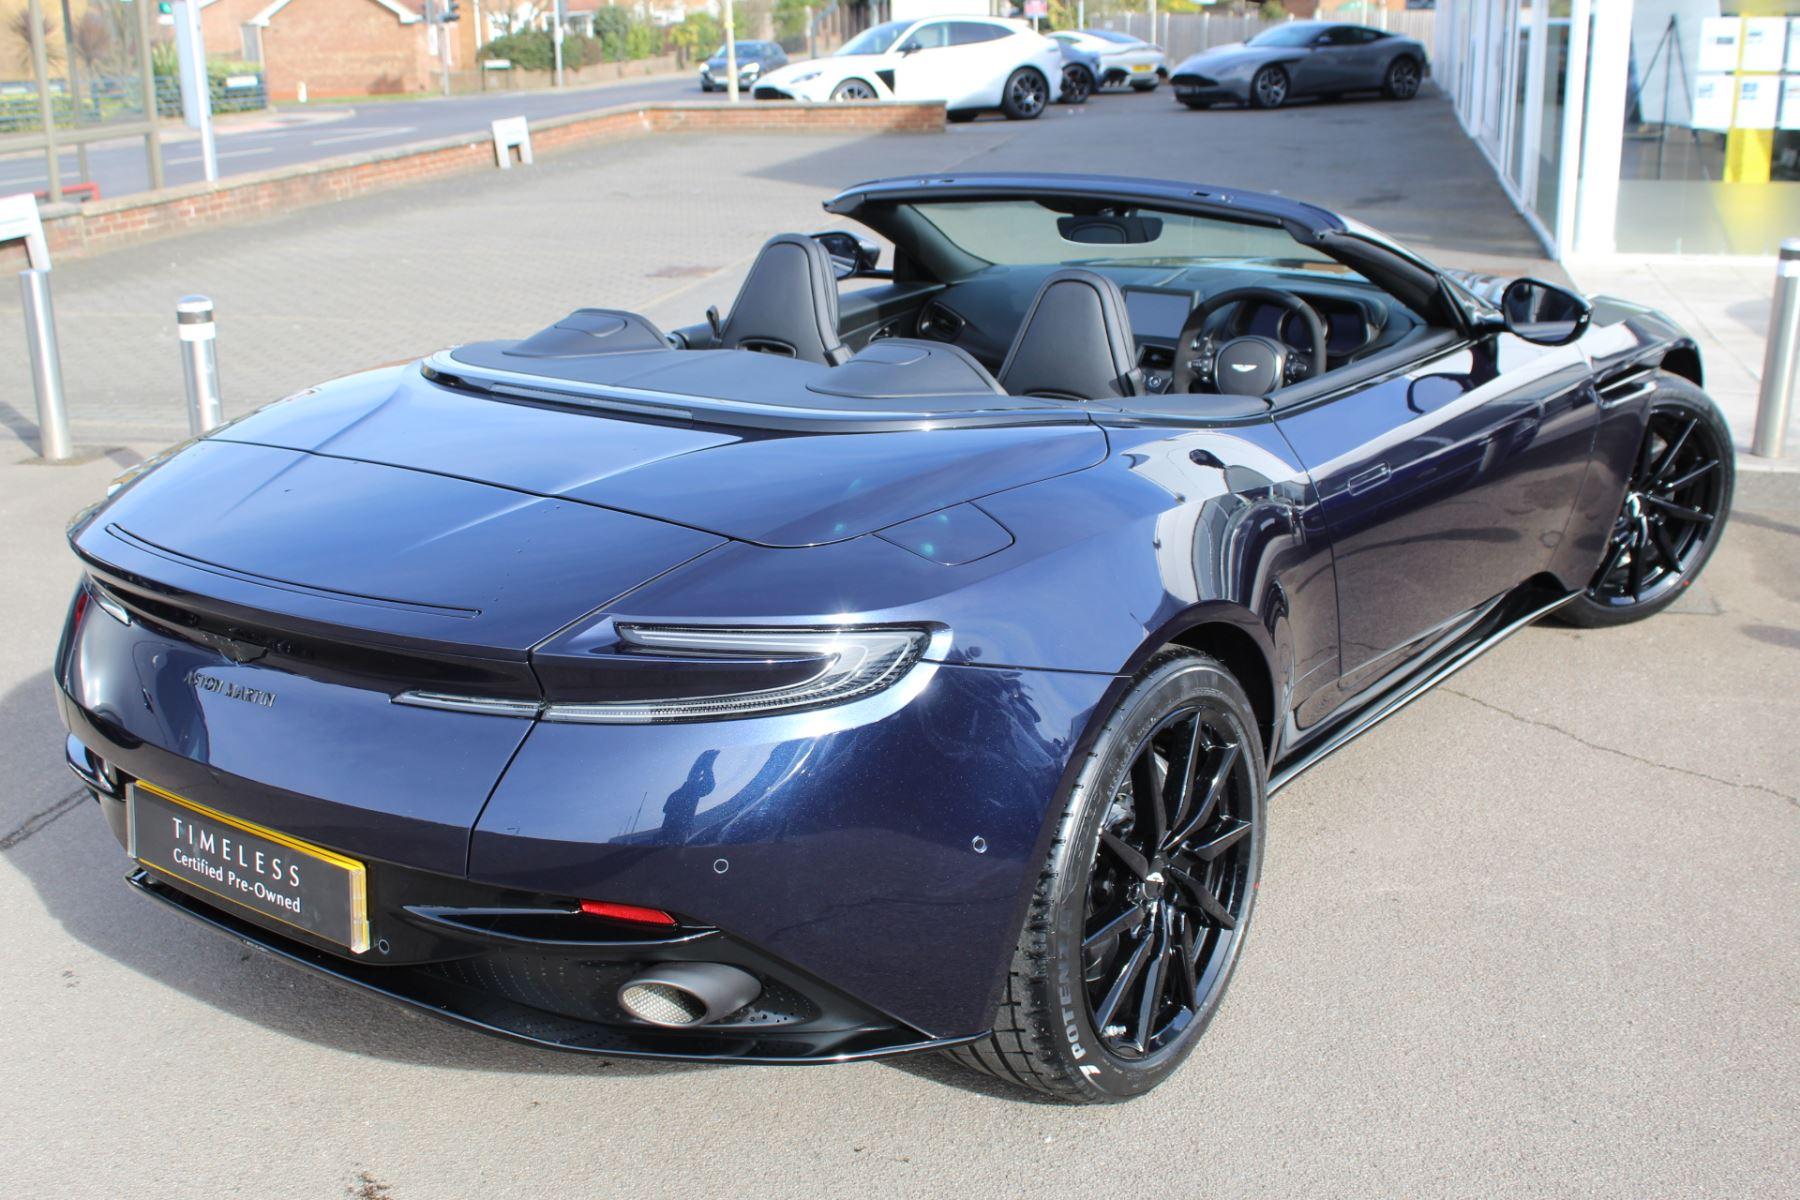 Aston Martin DB11 Volante V8 Volante 2dr Touchtronic image 9